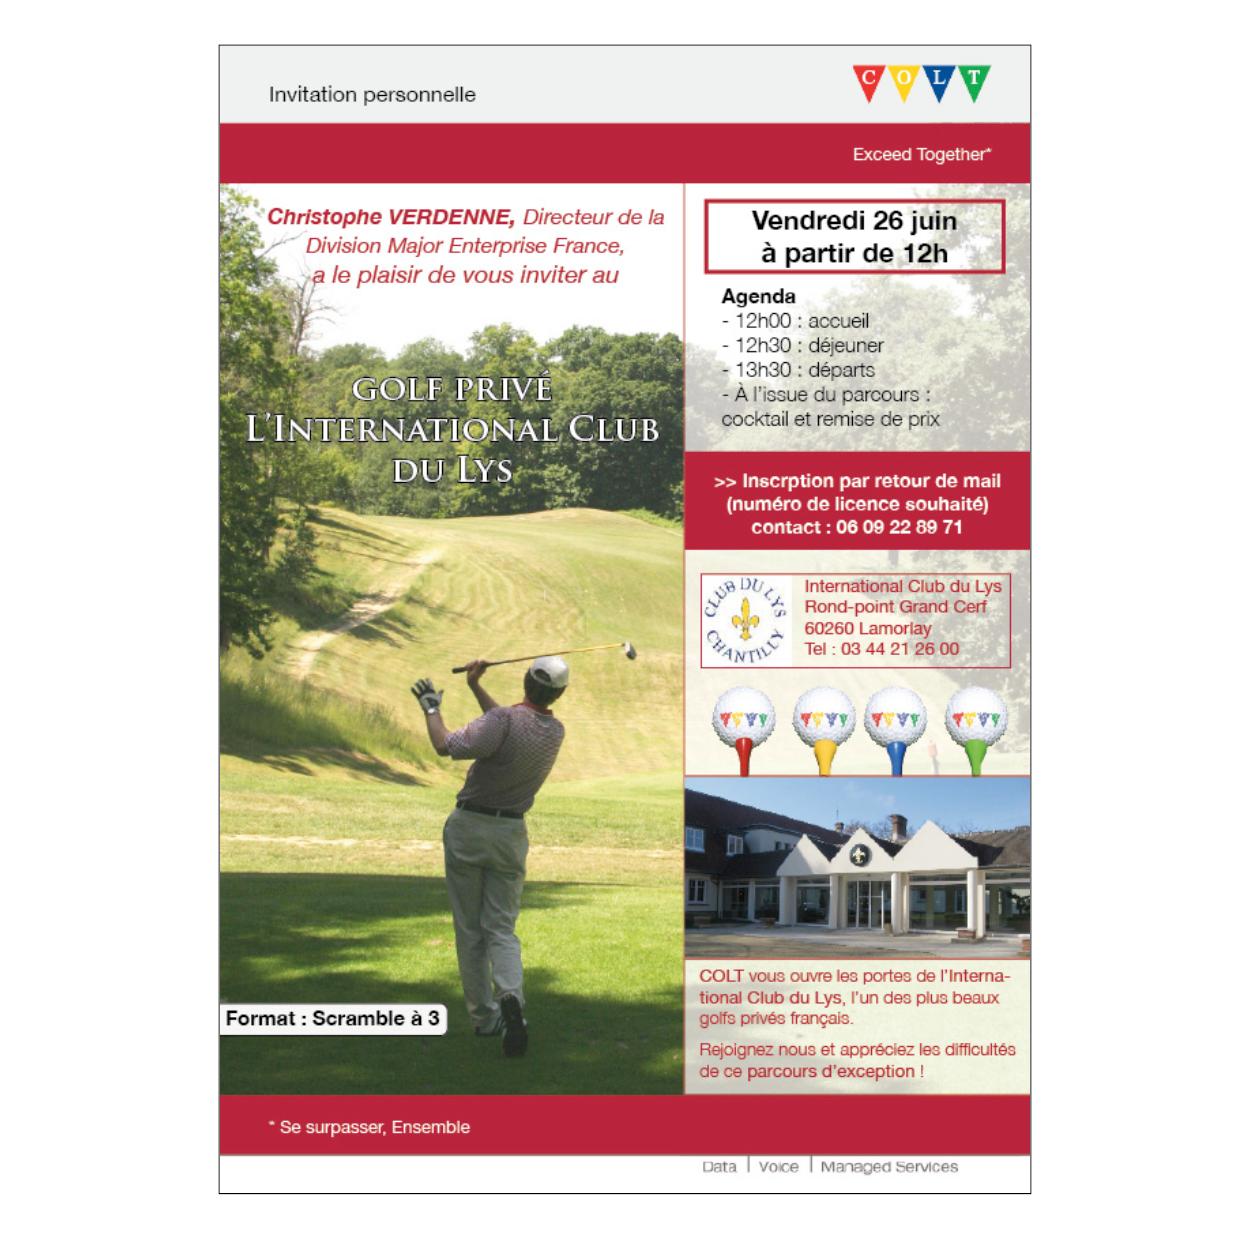 stage COLT Telecom invitation golf